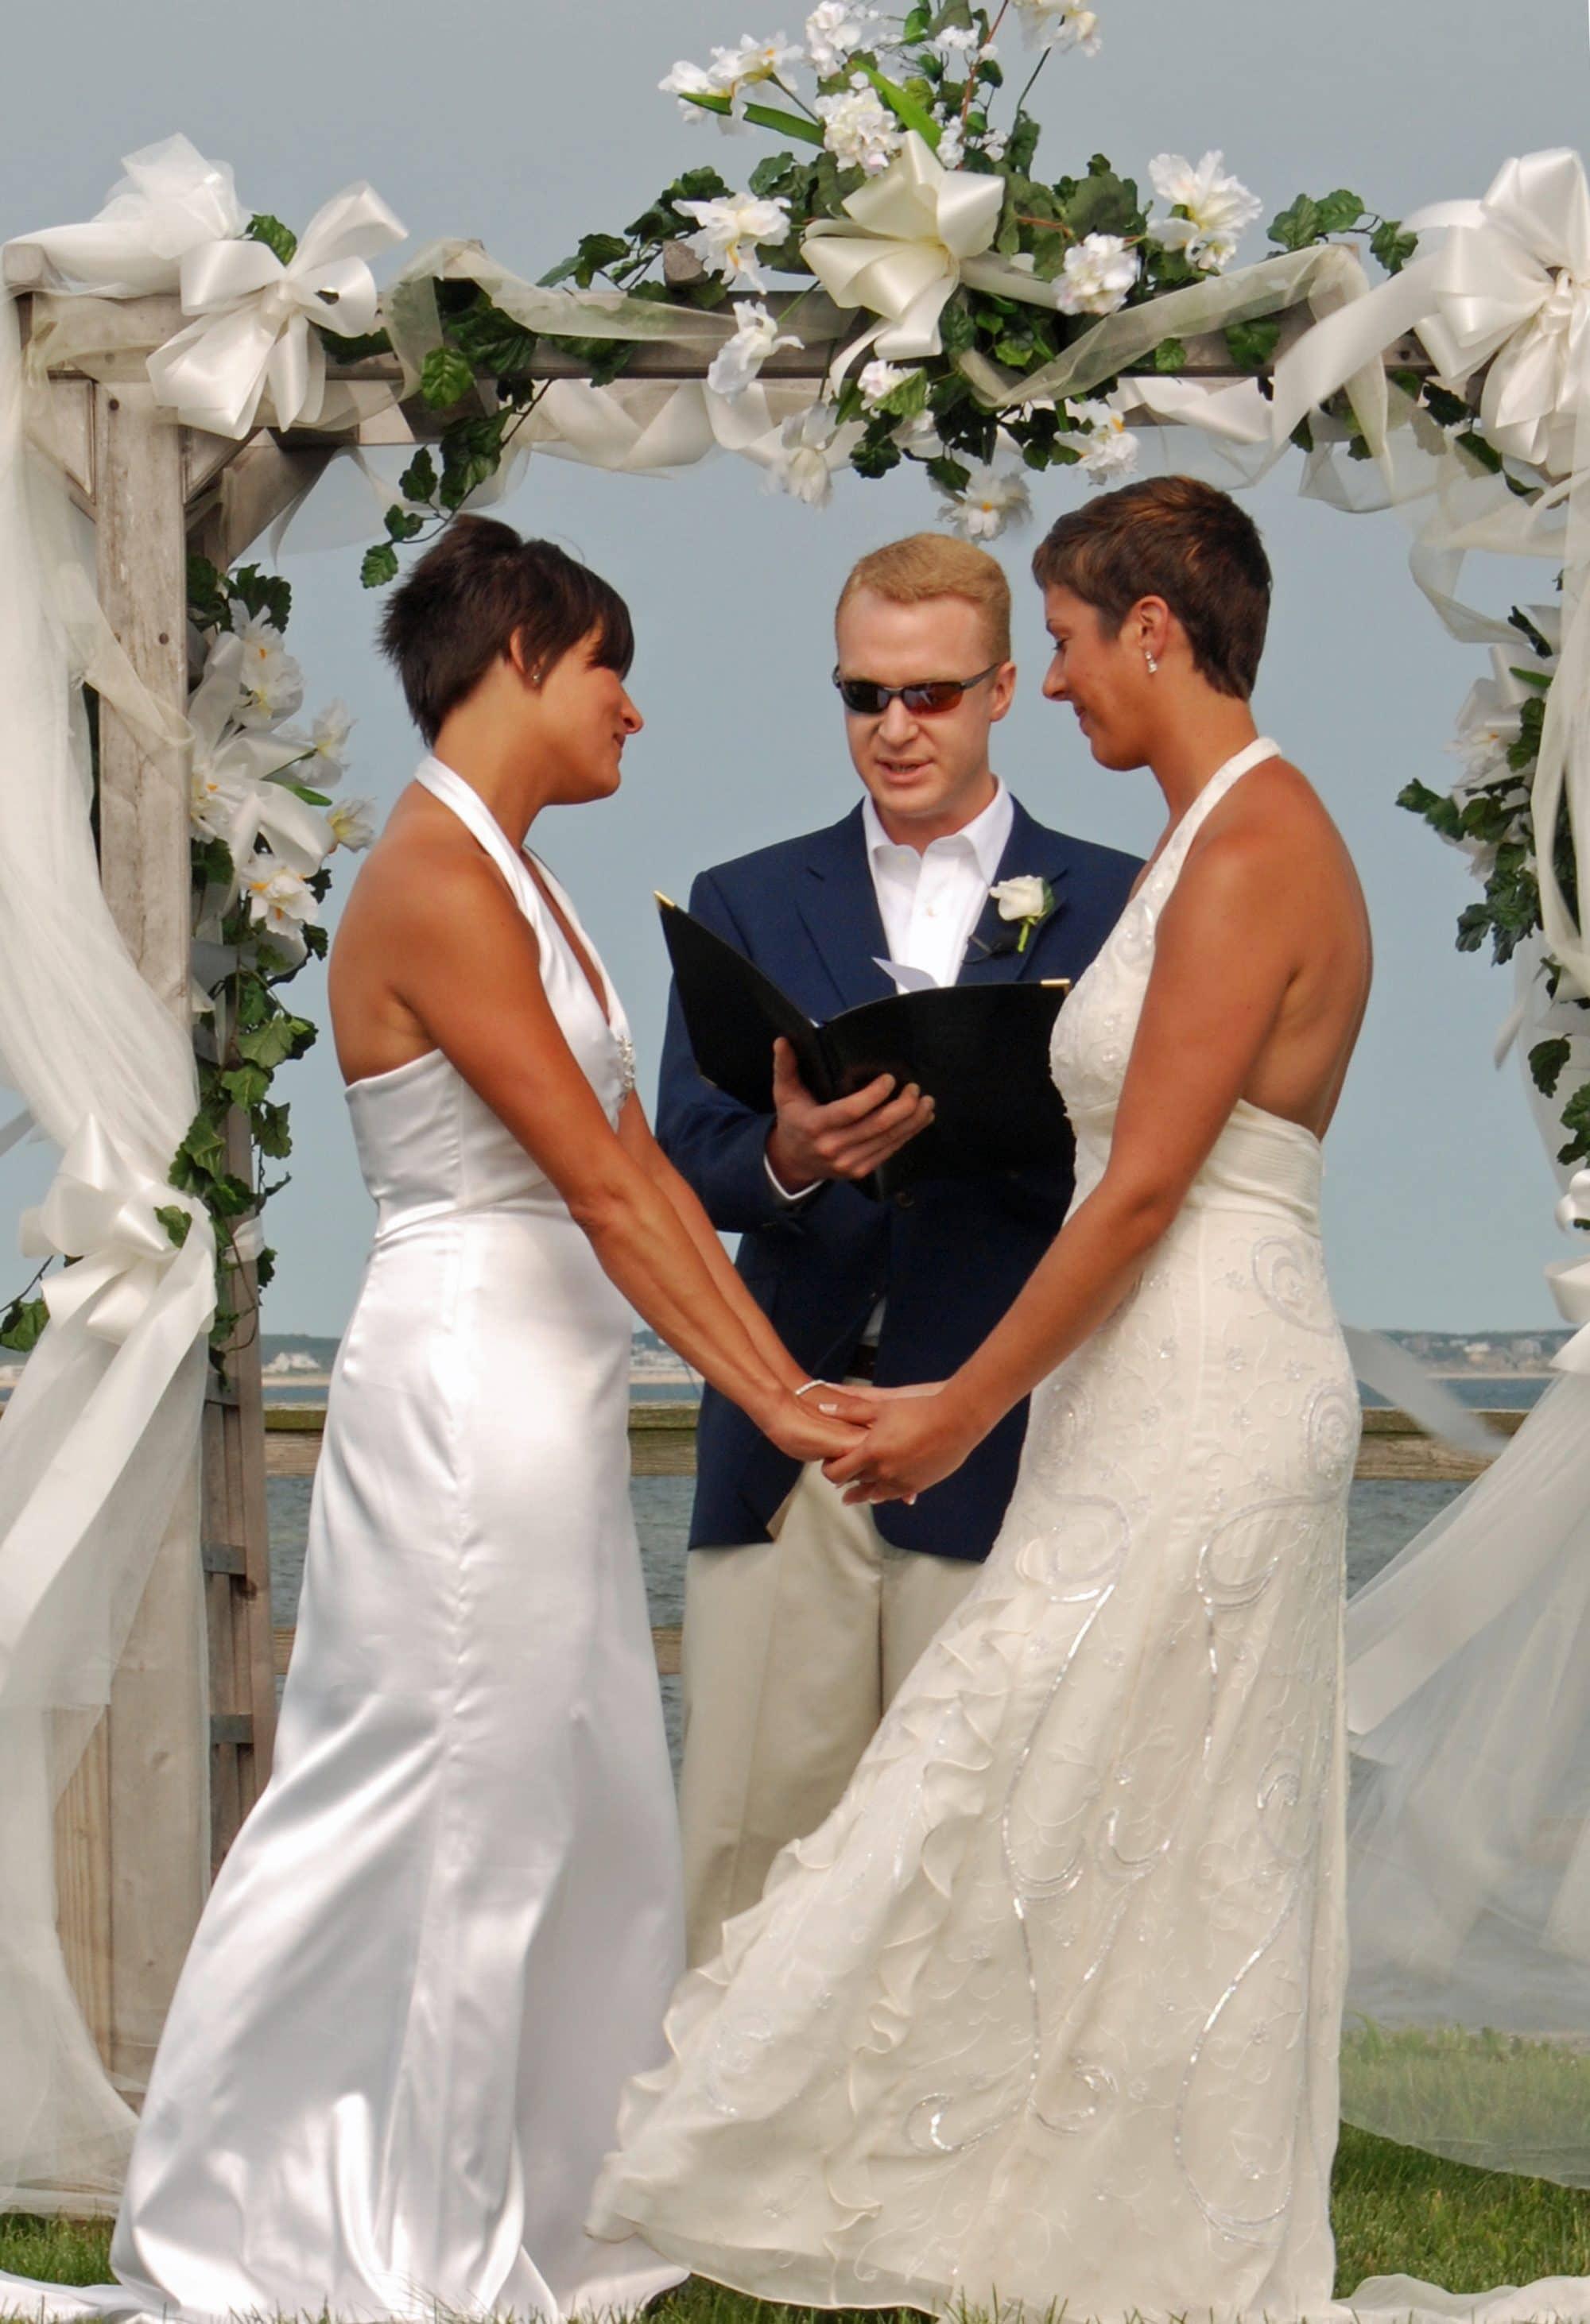 wedding pictures from kara k cd 1 083 (002)